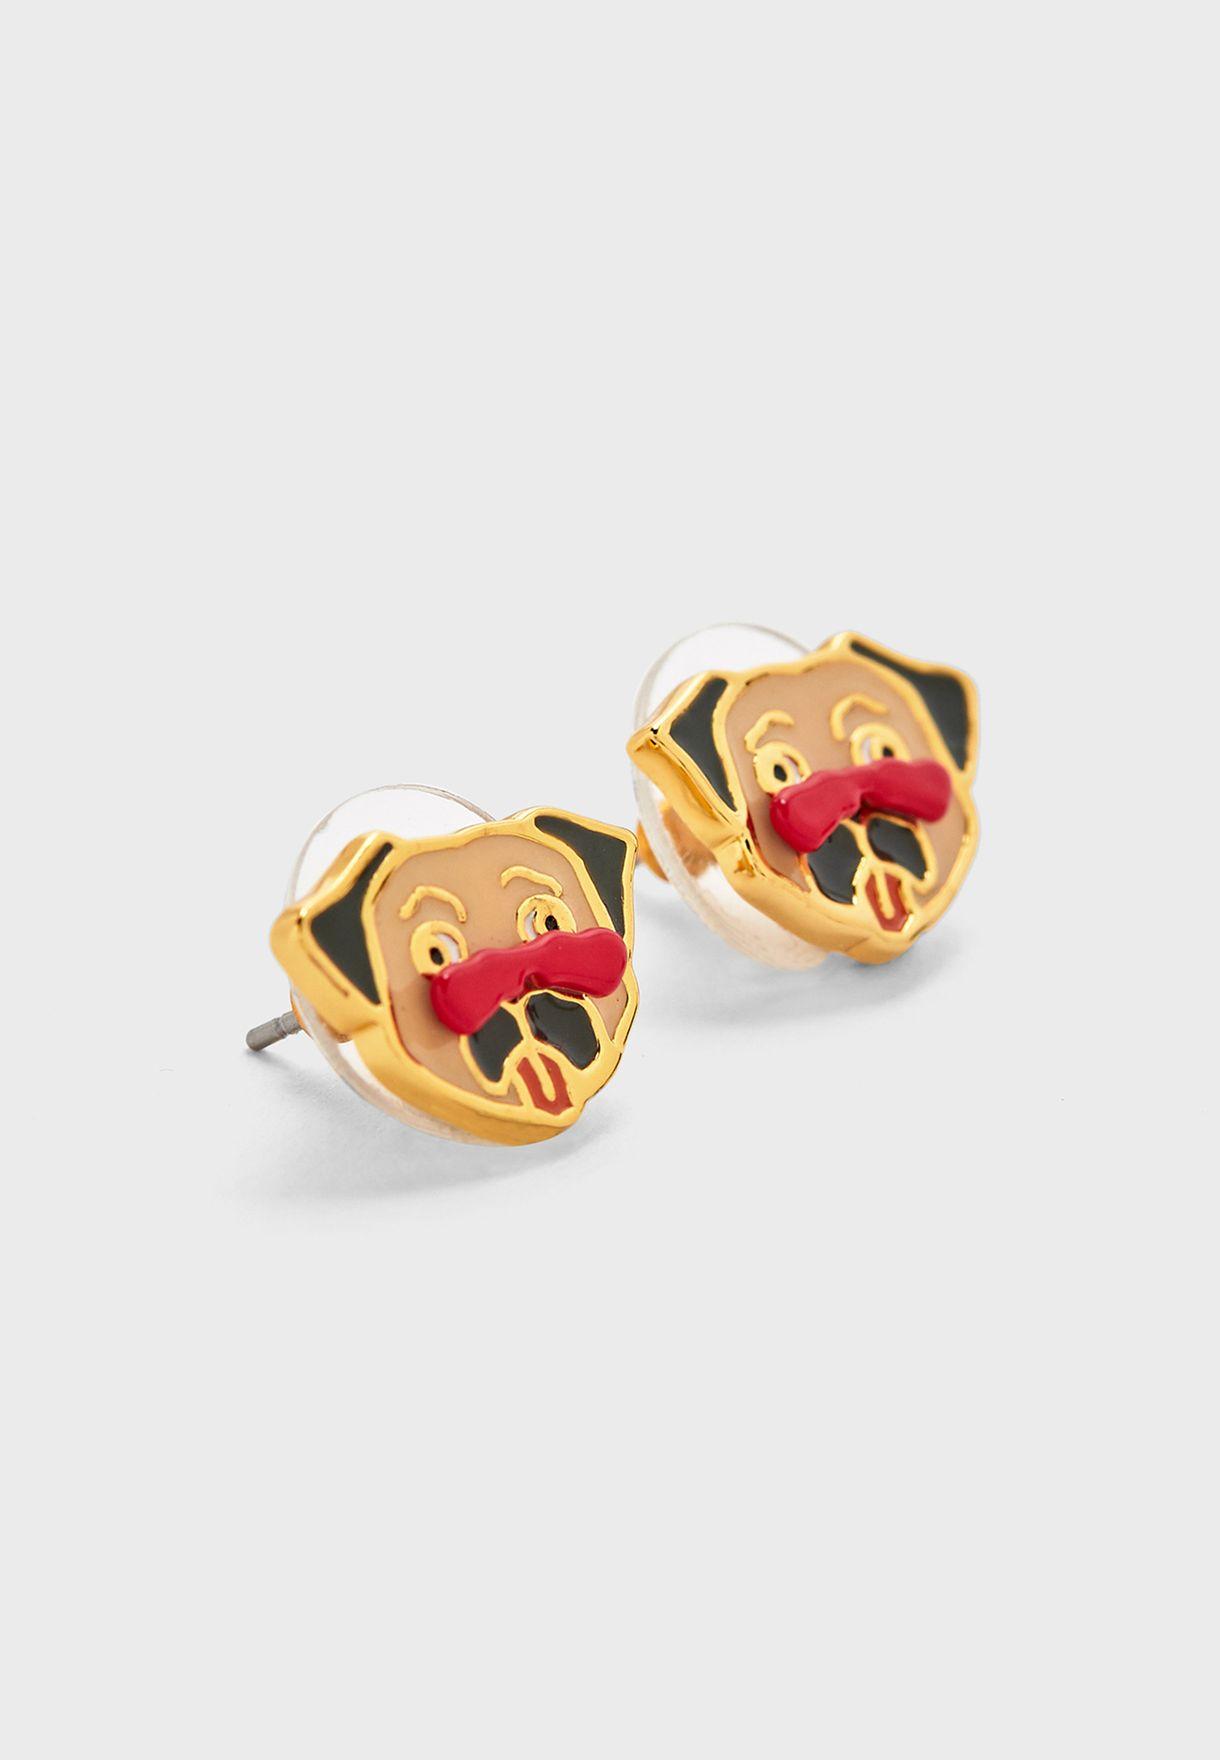 Charming Pug Stud Earrings